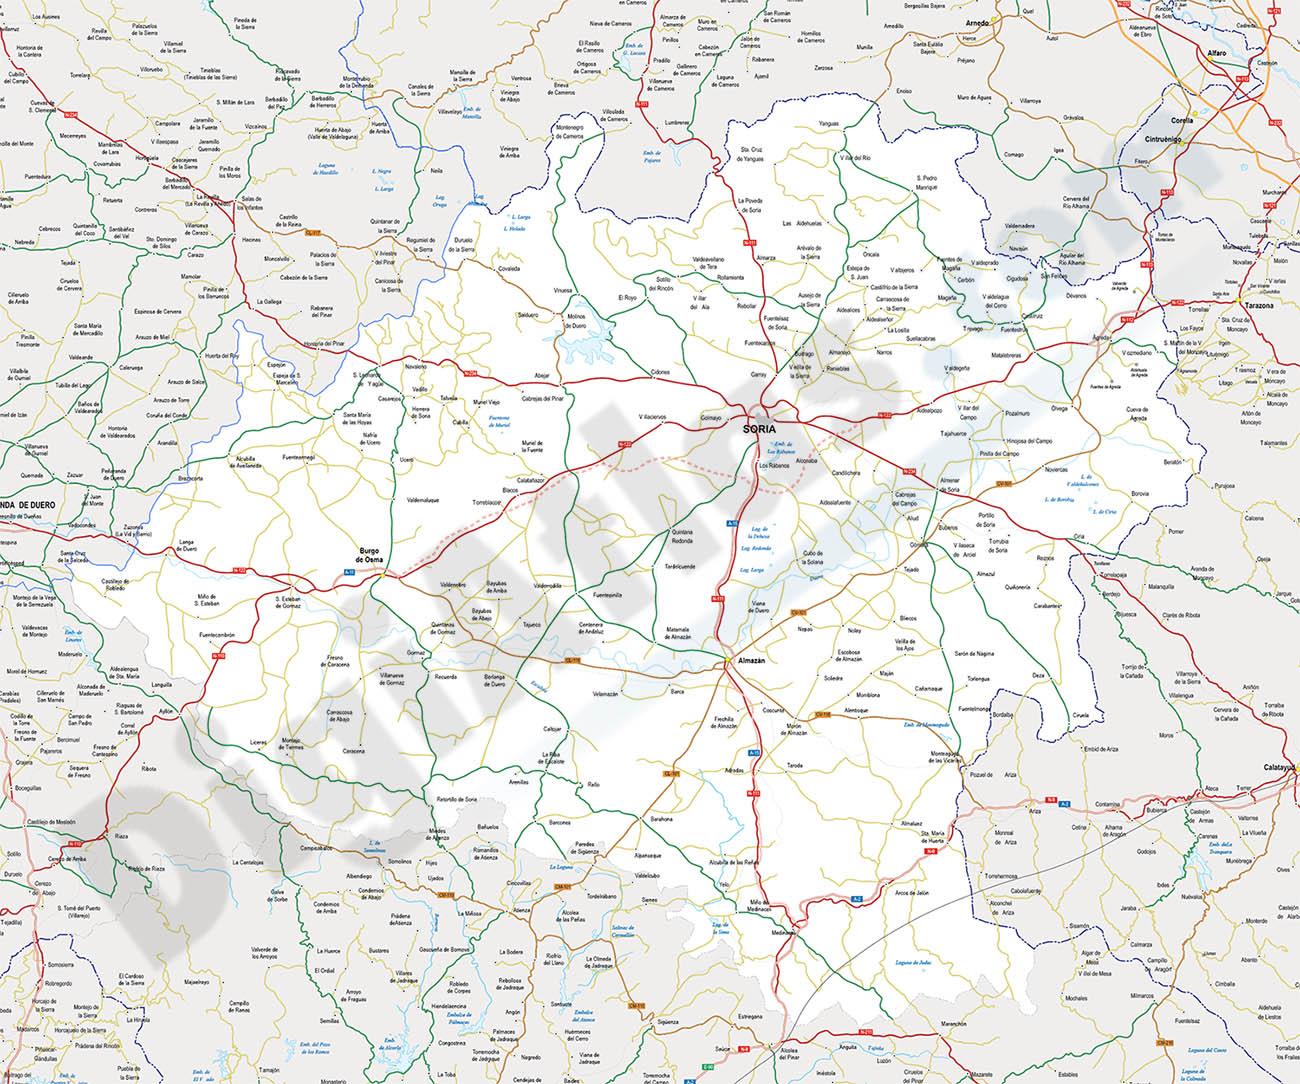 Map of Soria